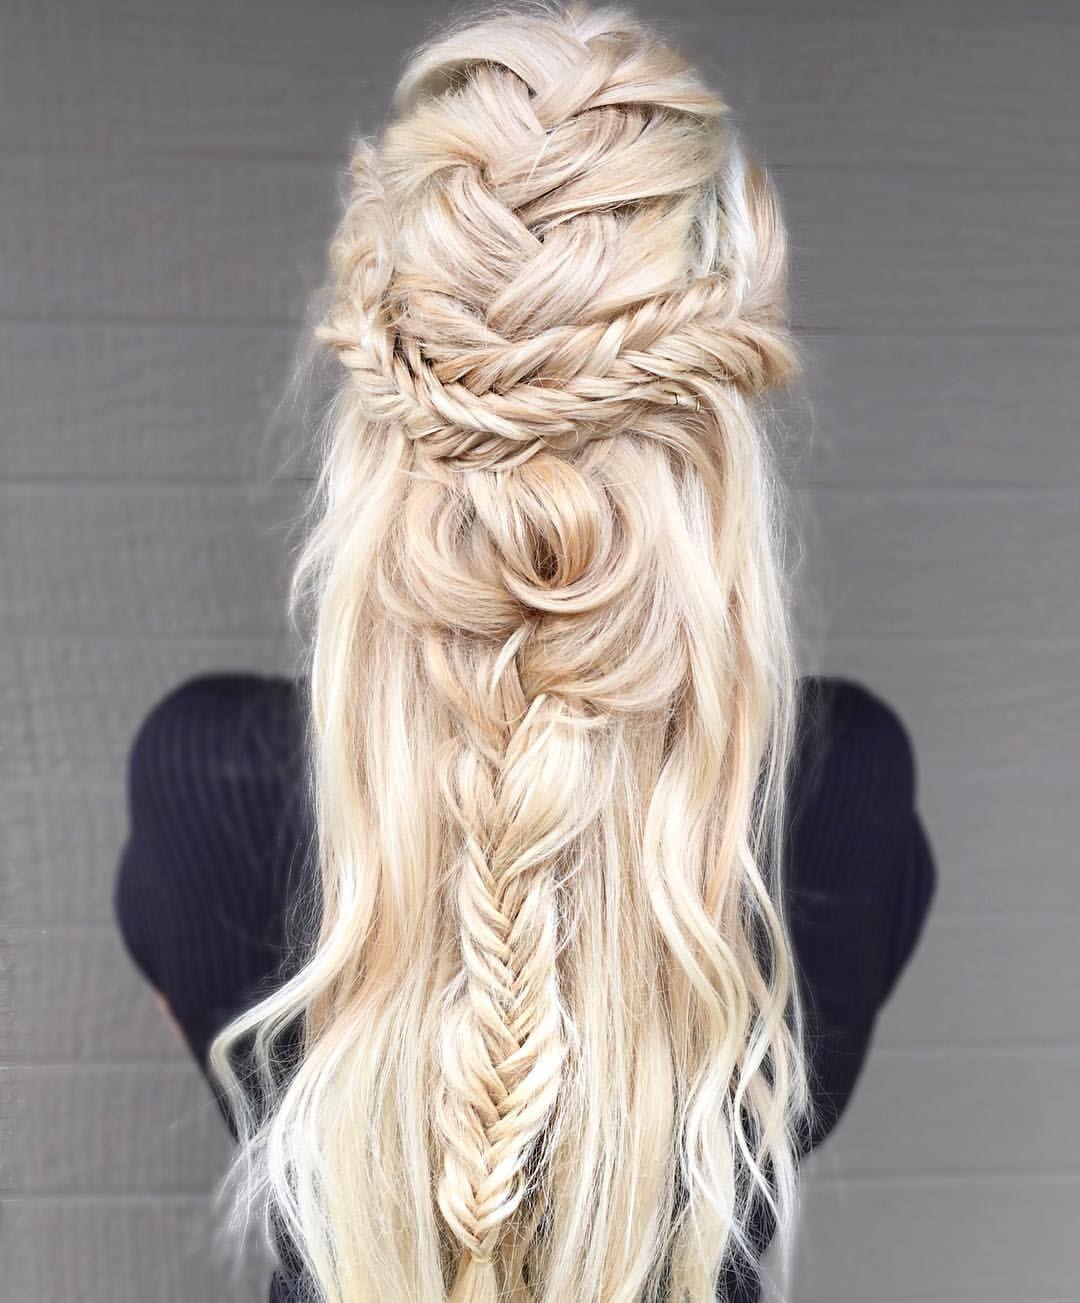 60 Cute Boho Hairstyles For Short, Long, Medium Length Hair